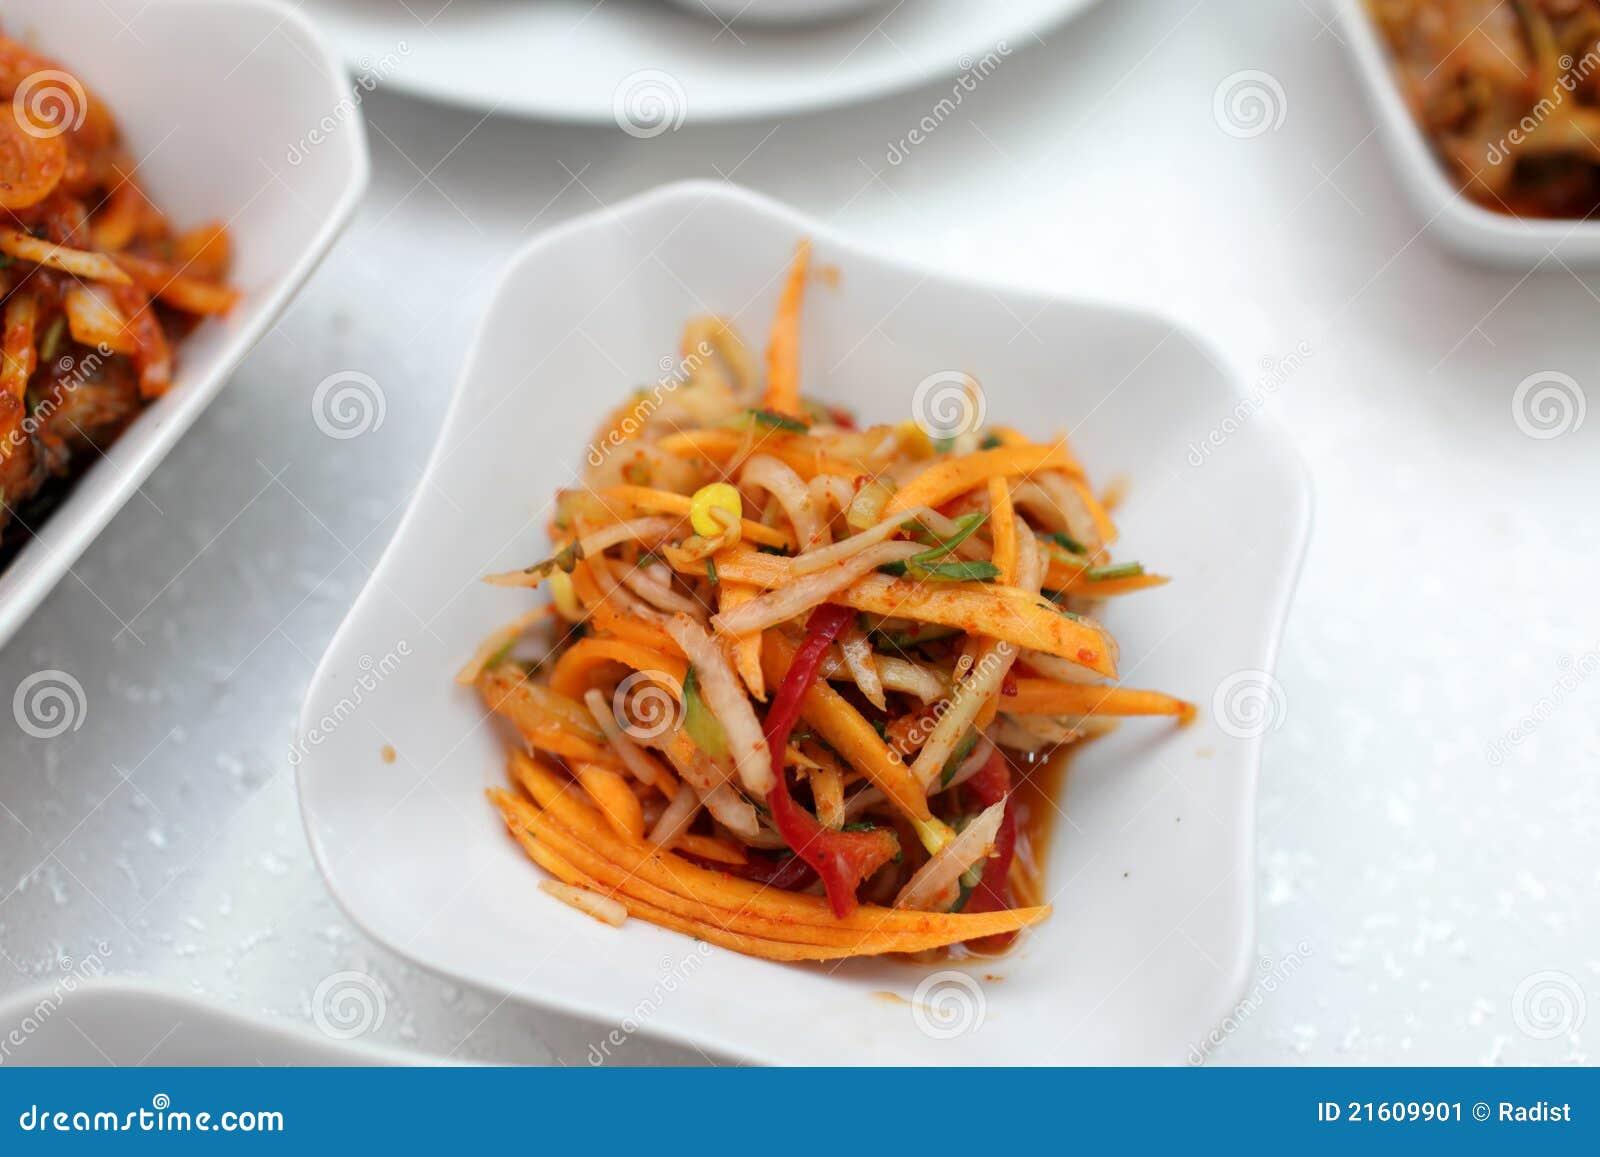 It is korean spicy carrot salad in the restaurant